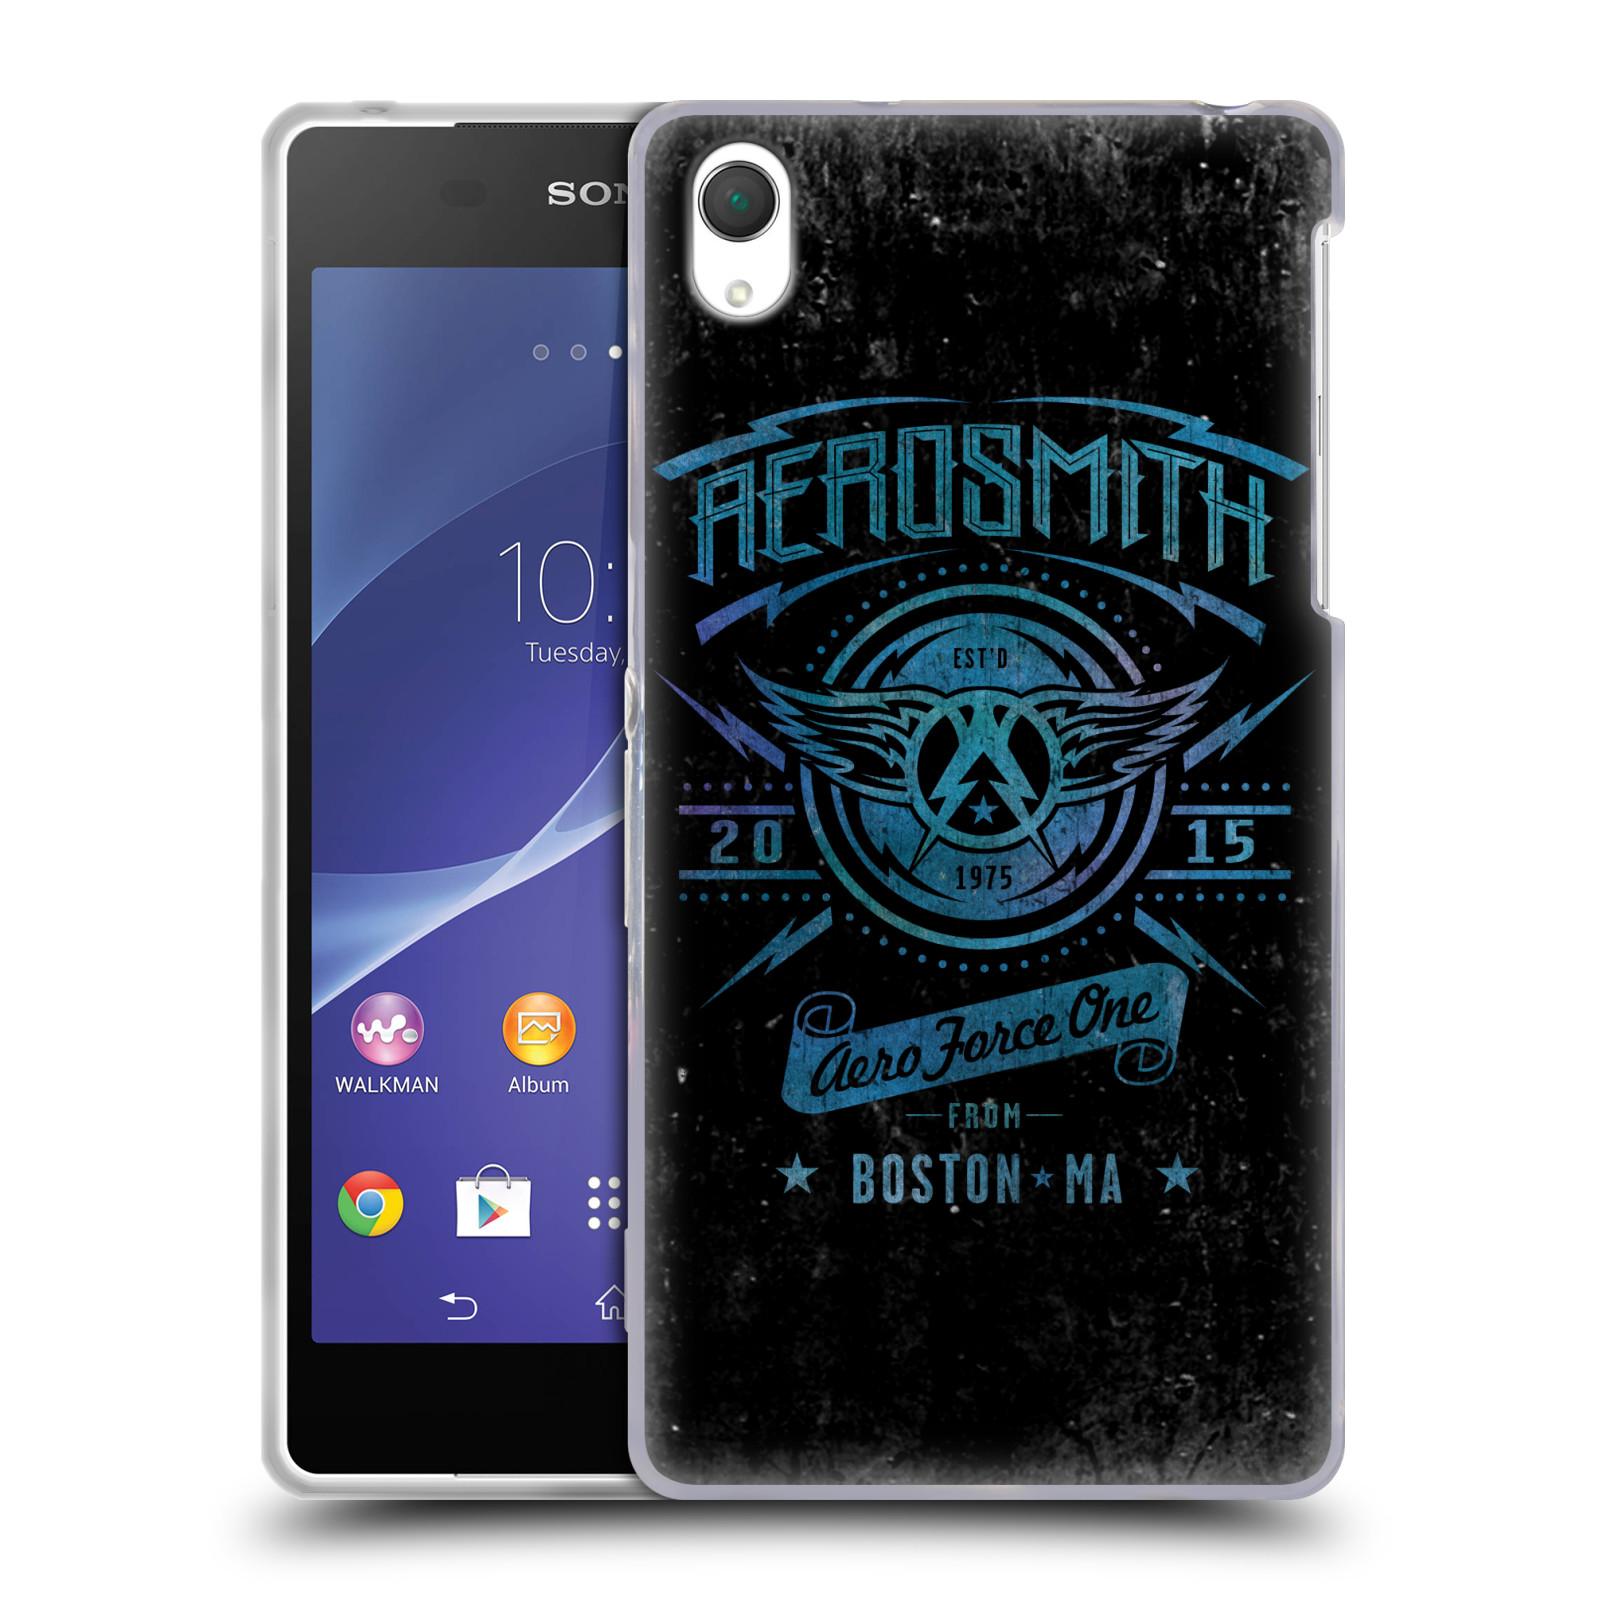 Silikonové pouzdro na mobil Sony Xperia Z2 D6503 HEAD CASE - Aerosmith - Aero Force One